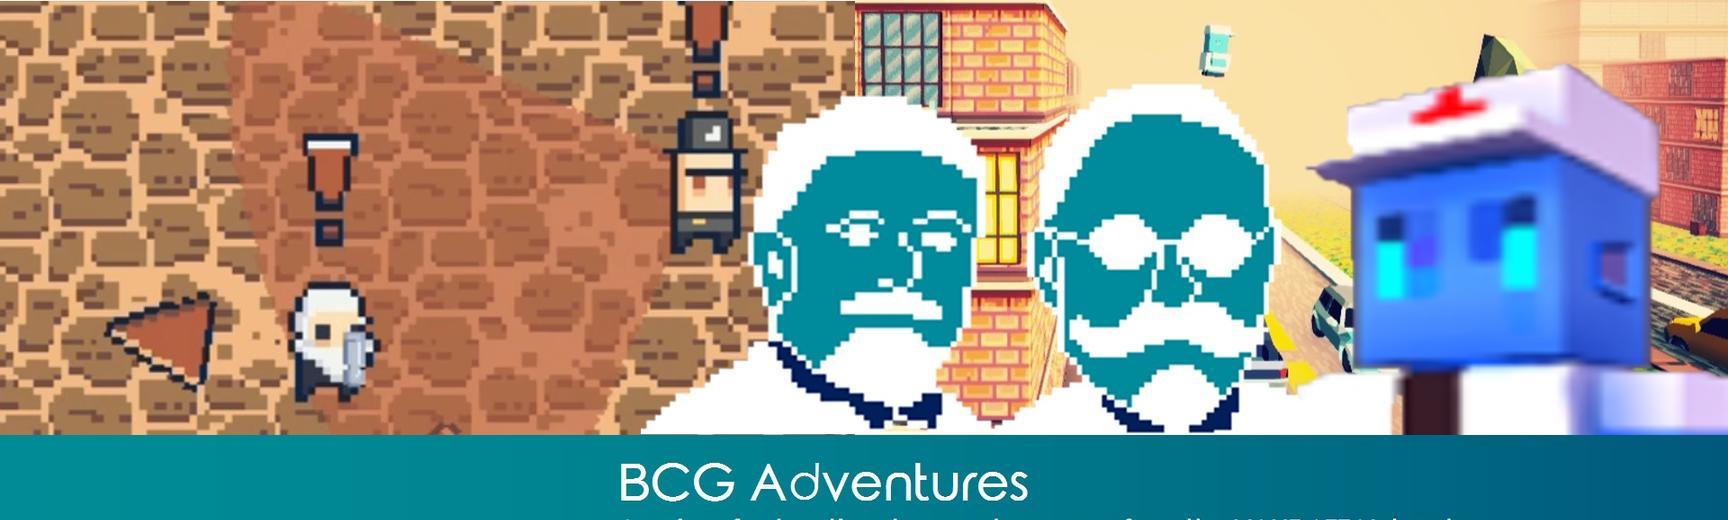 BCG Adventures